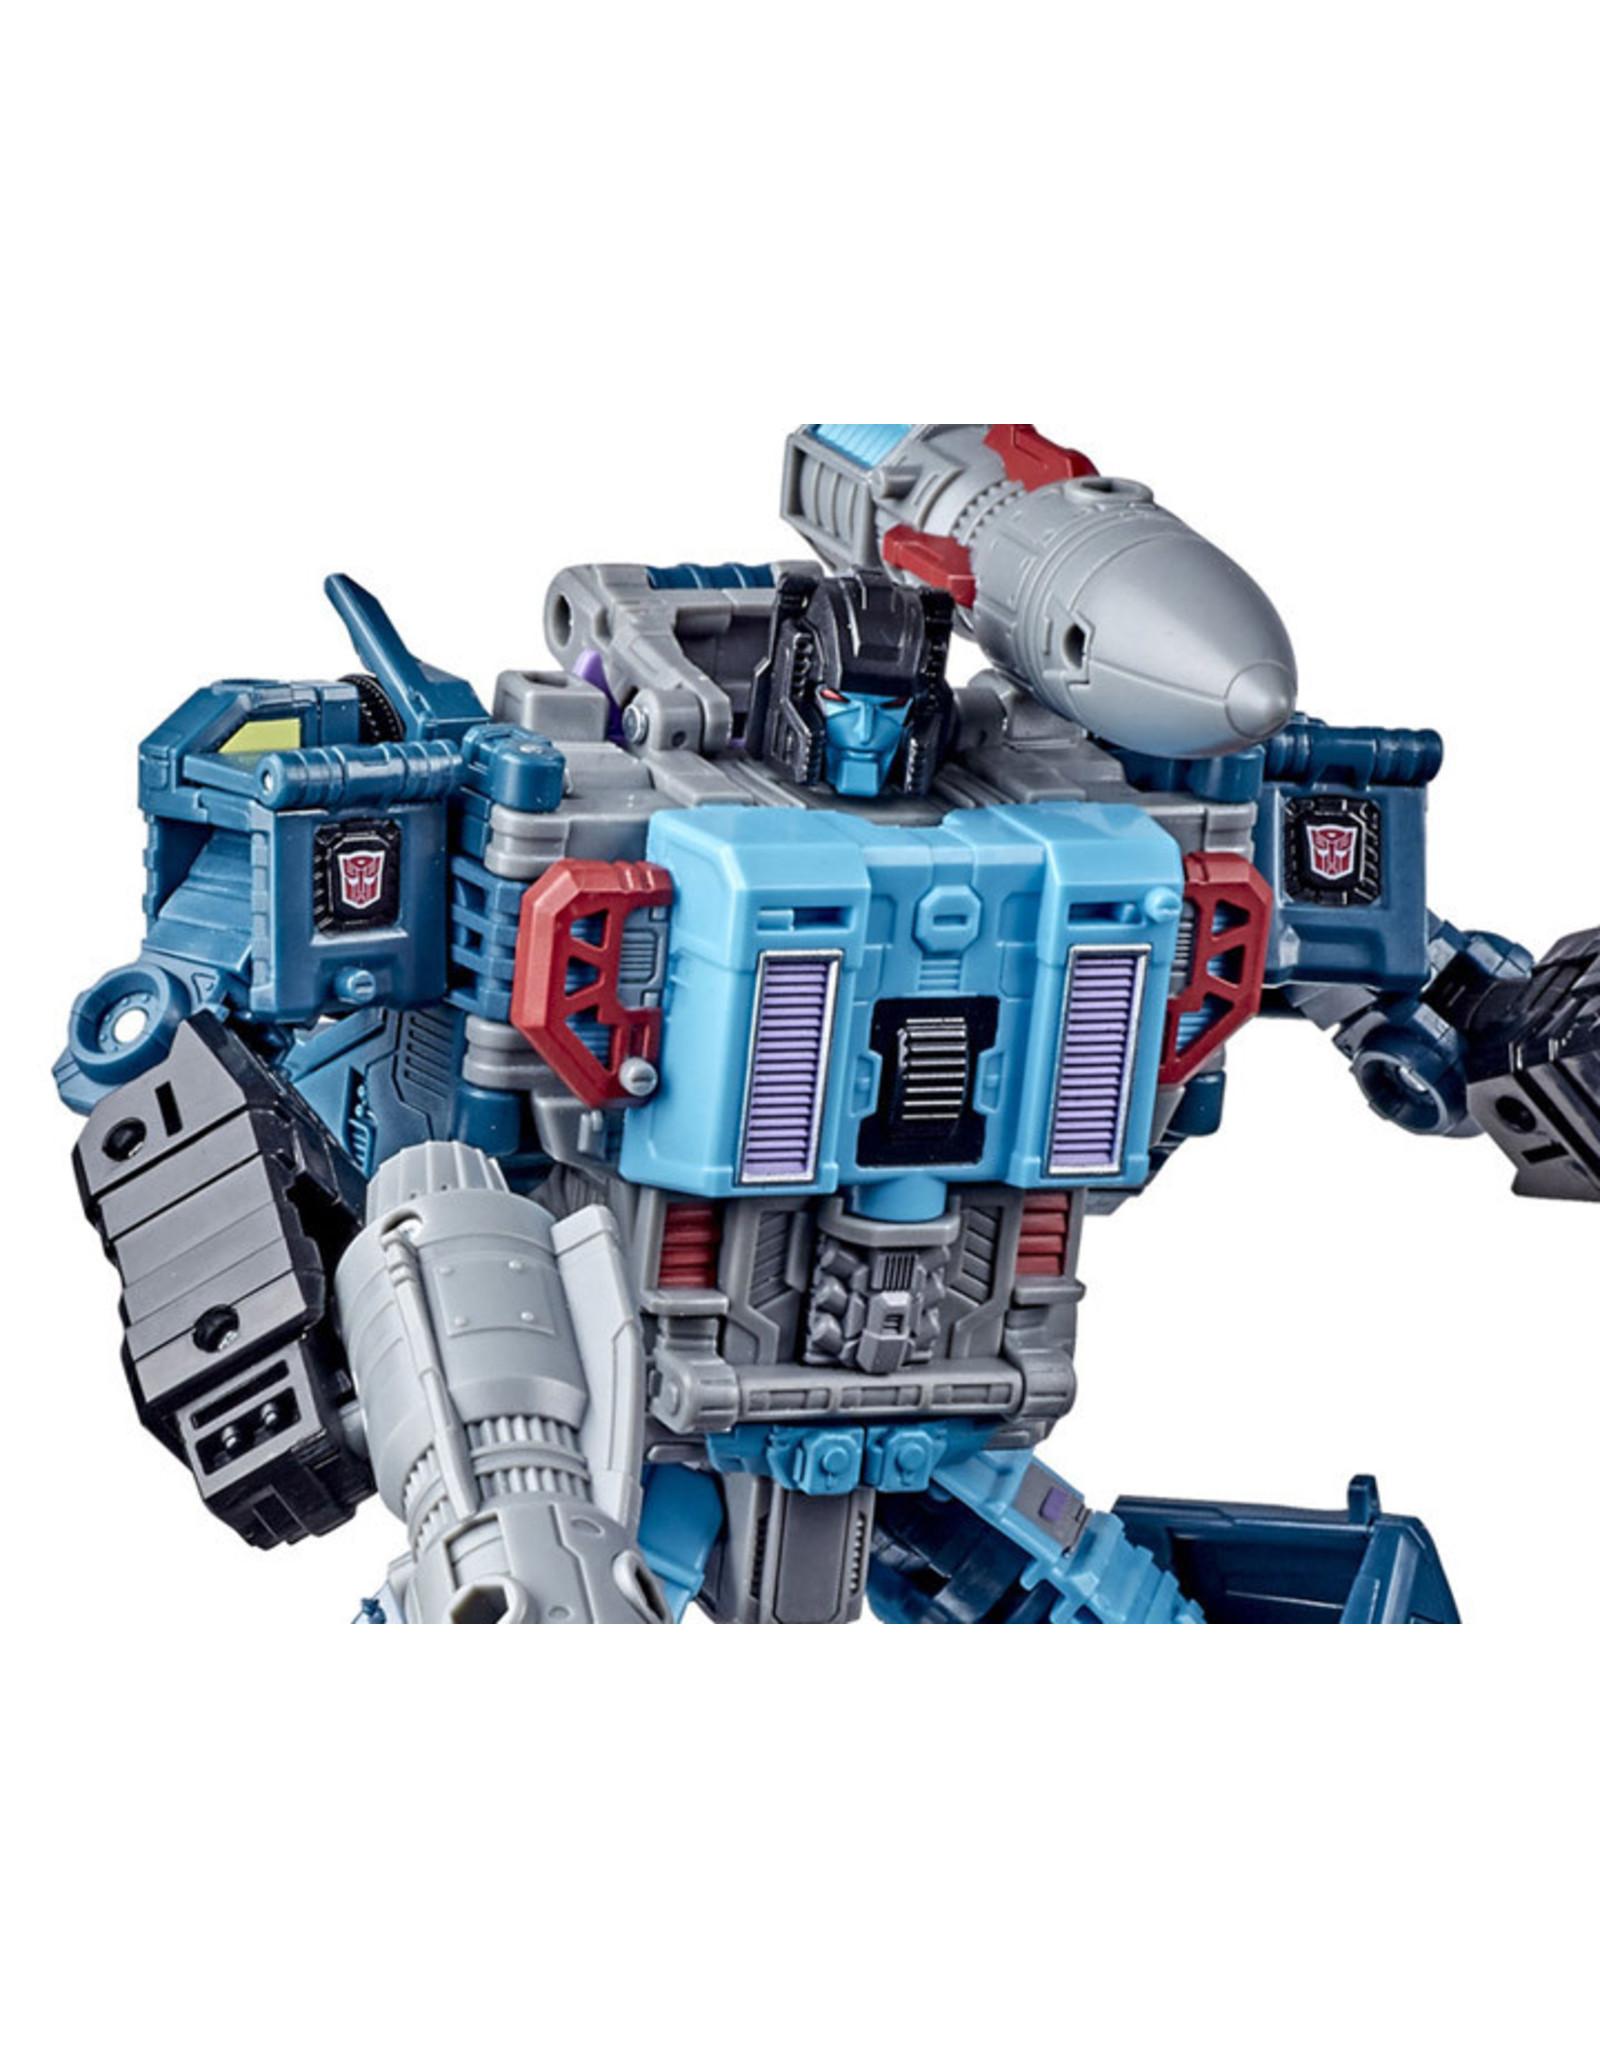 Transformers War for Cybertron Earthrise Leader Optimus Prime Doubledealer PIC